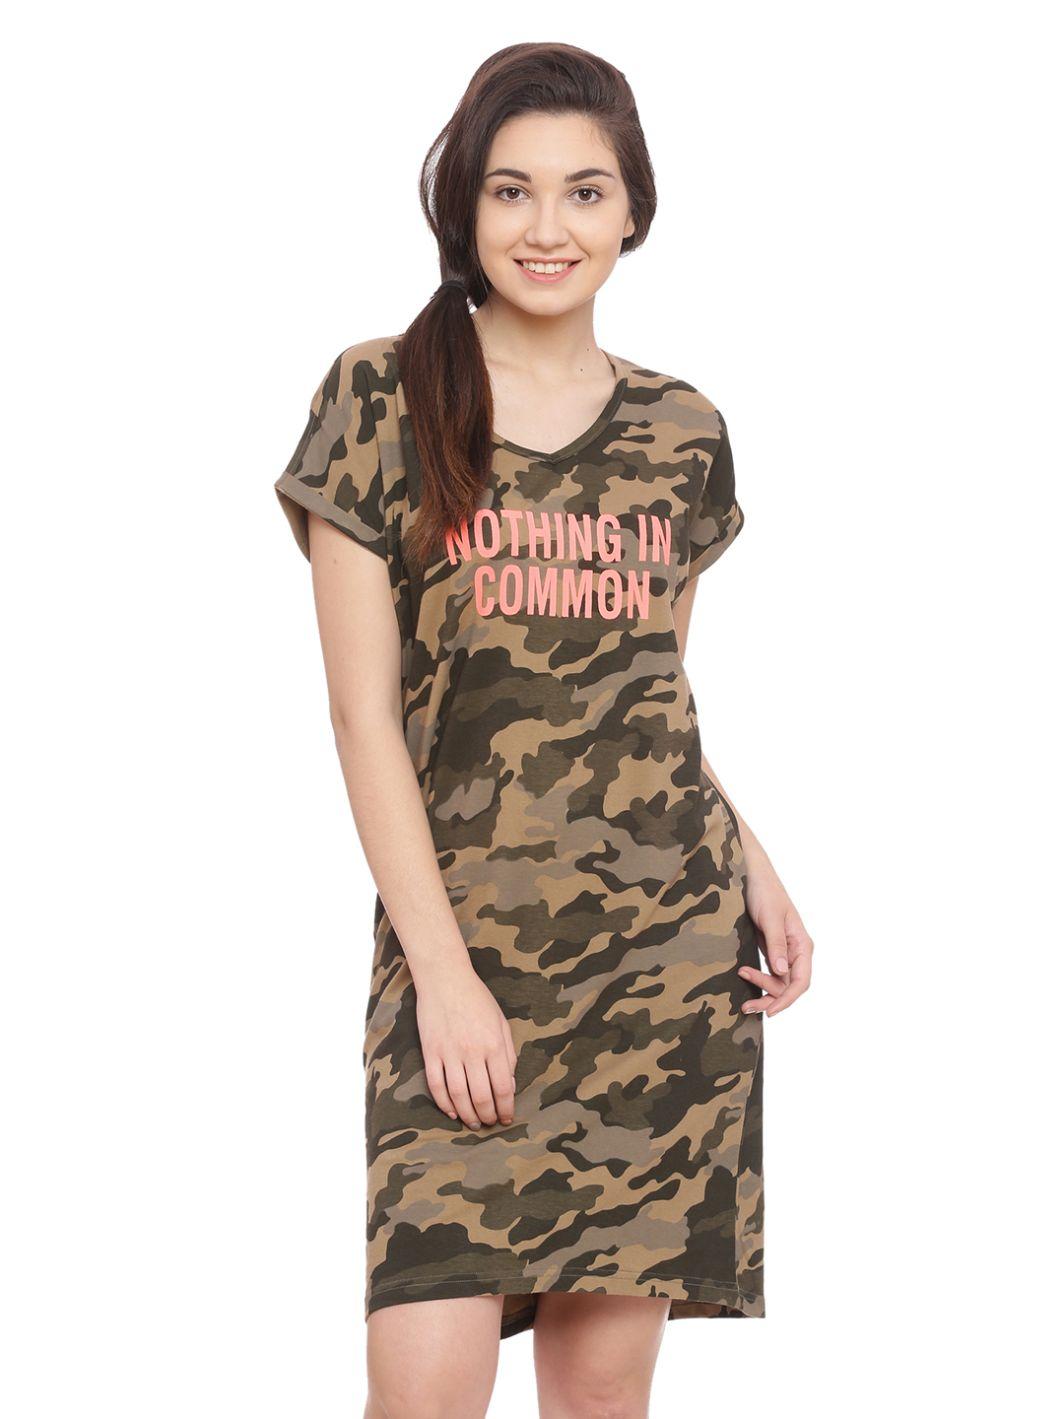 Slumber Jill Nothing in Common Camouflage Sleepshirt